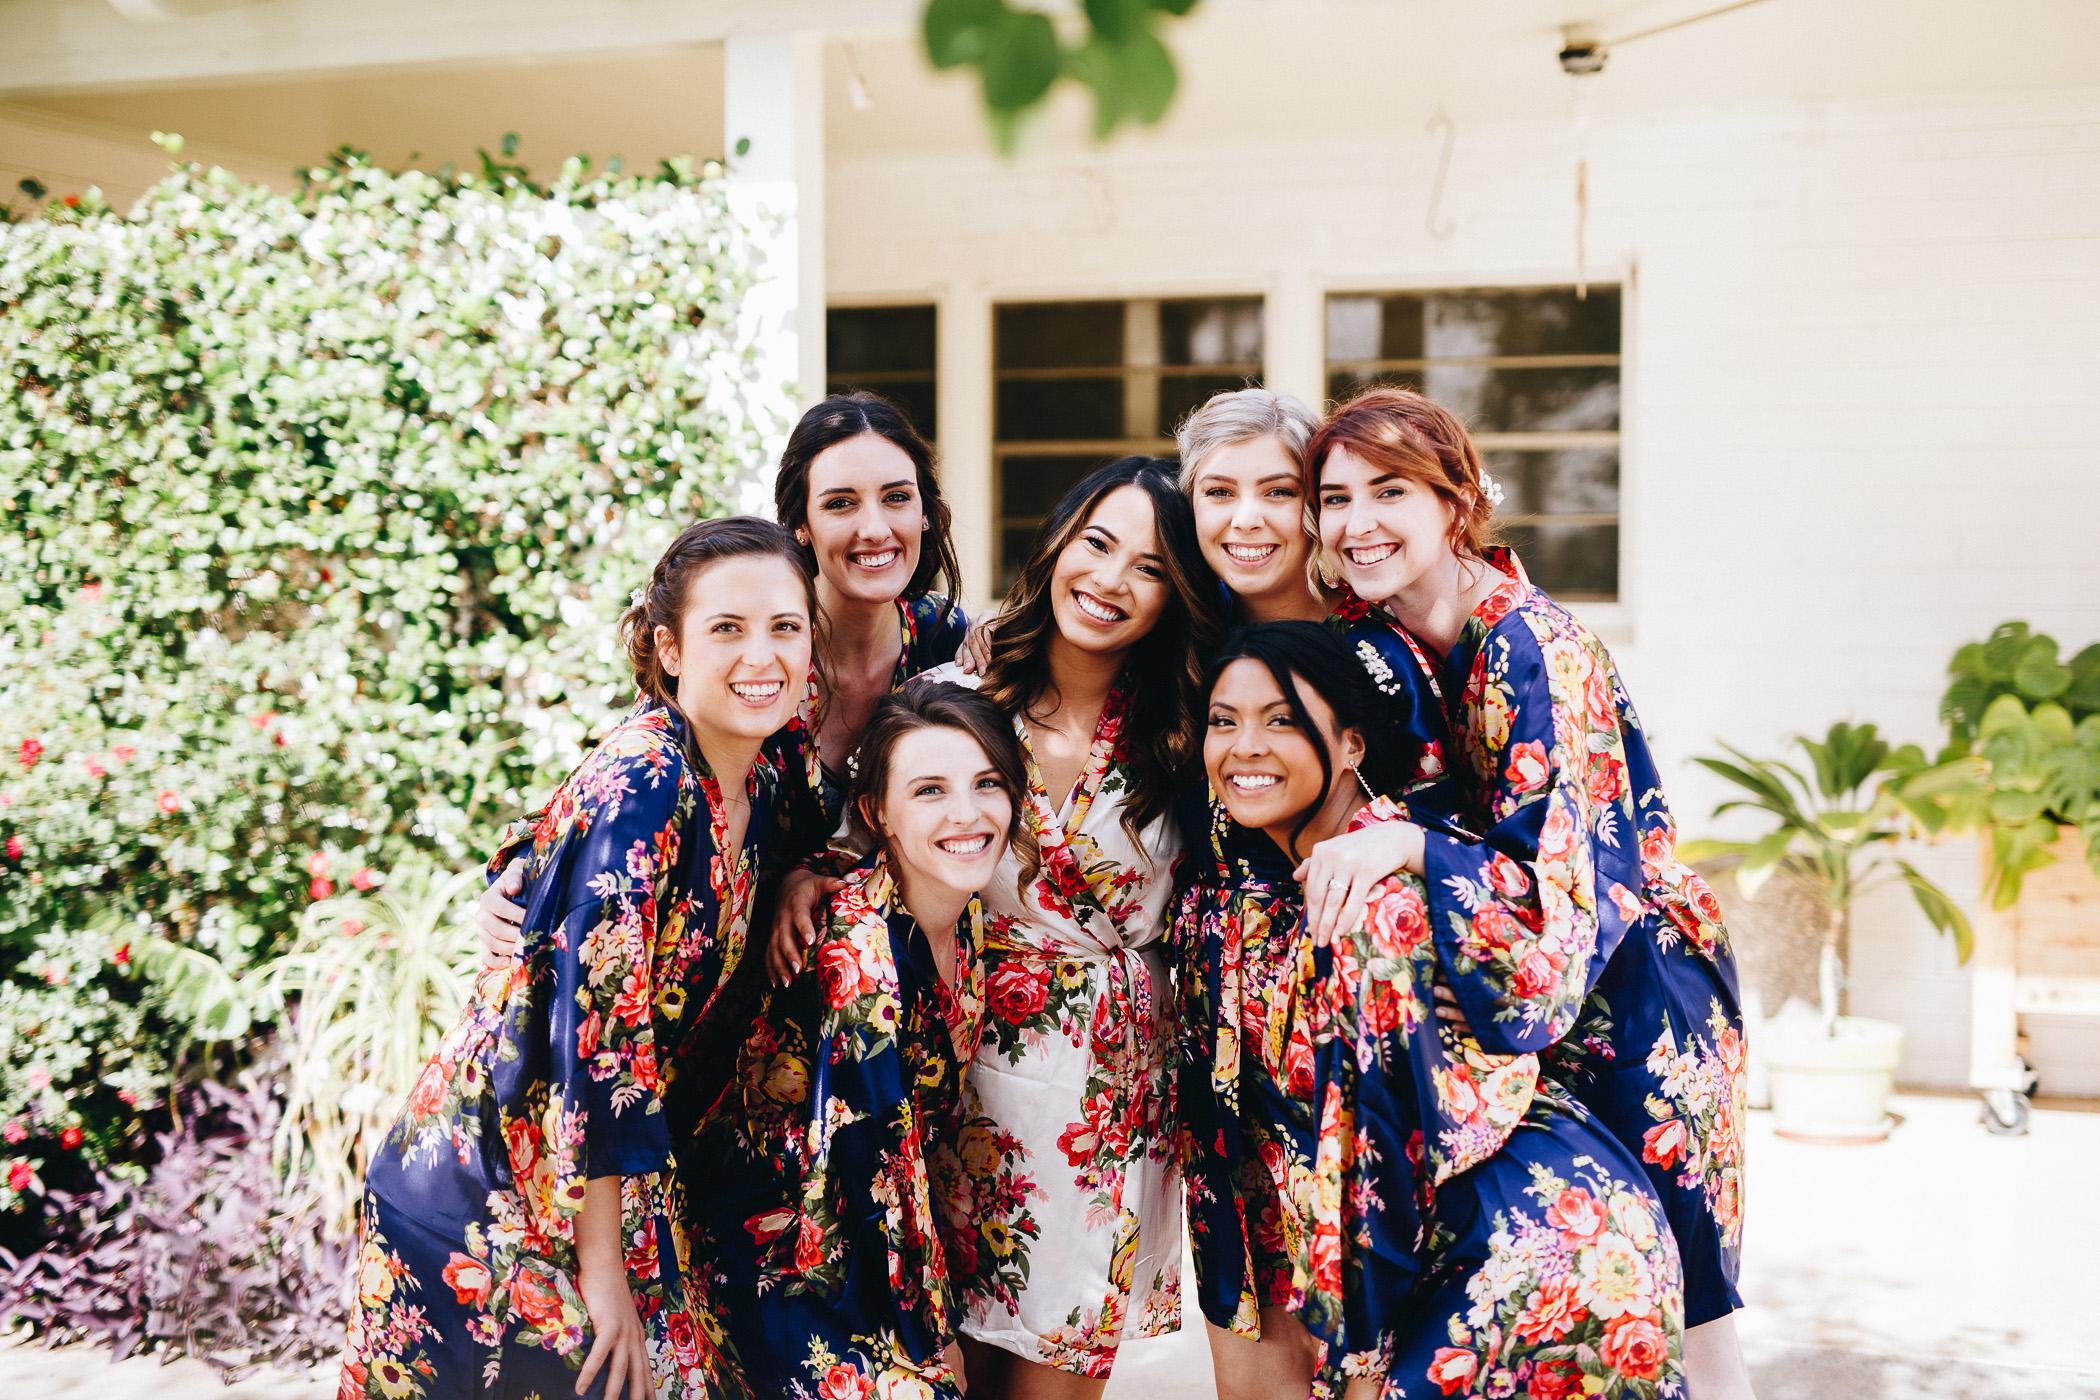 181104-Luxium-Weddings-Arizona-@matt__Le-Brandon-Kariana-Phoenix-Valley-Garden-Center-1007.jpg